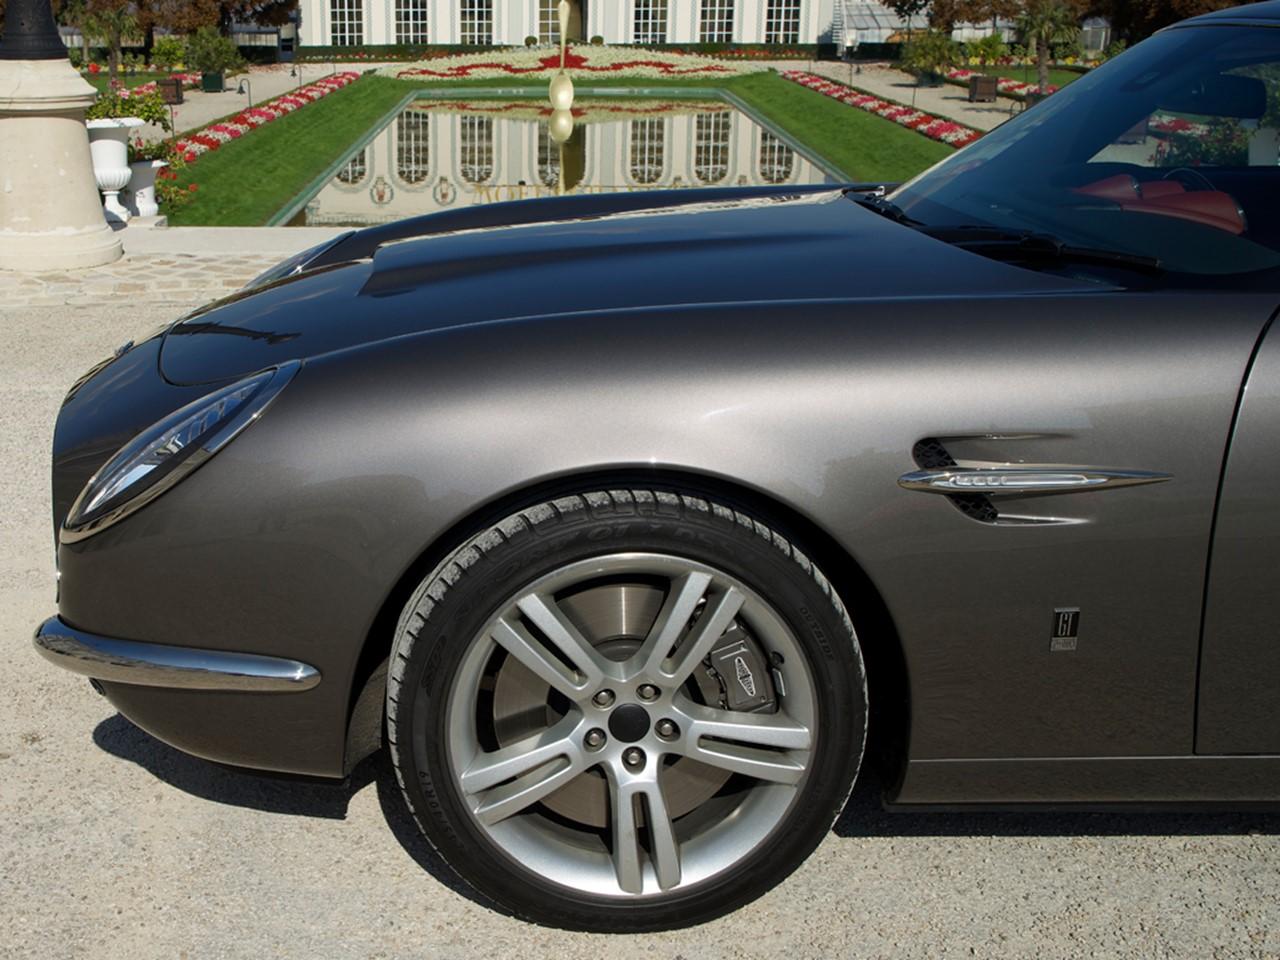 Speedback GT 10